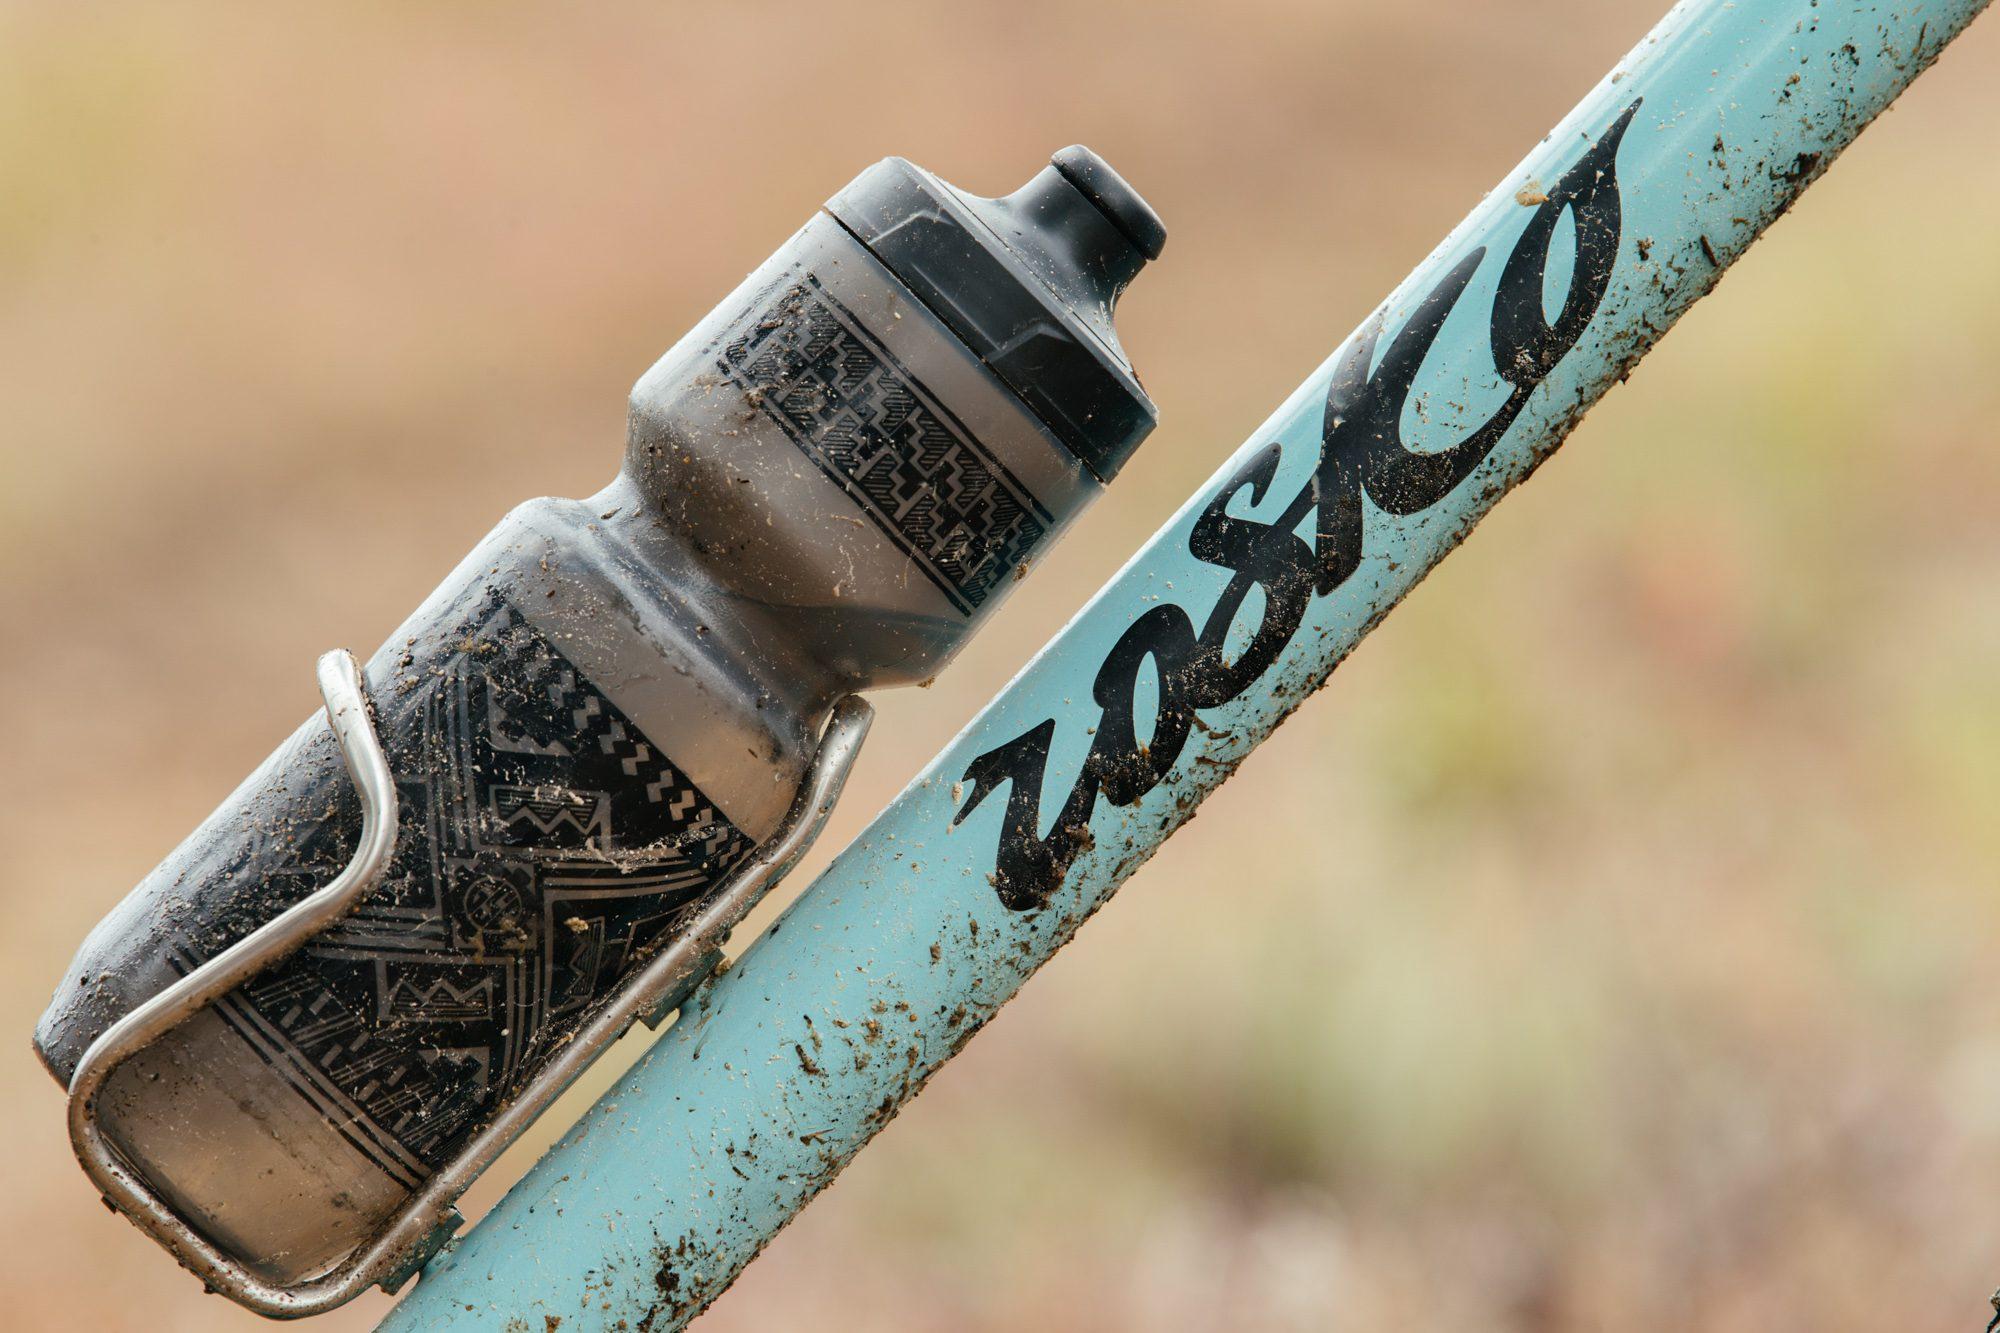 My Rosko Agave Slapper Hardtail Mountain Bike v2.0